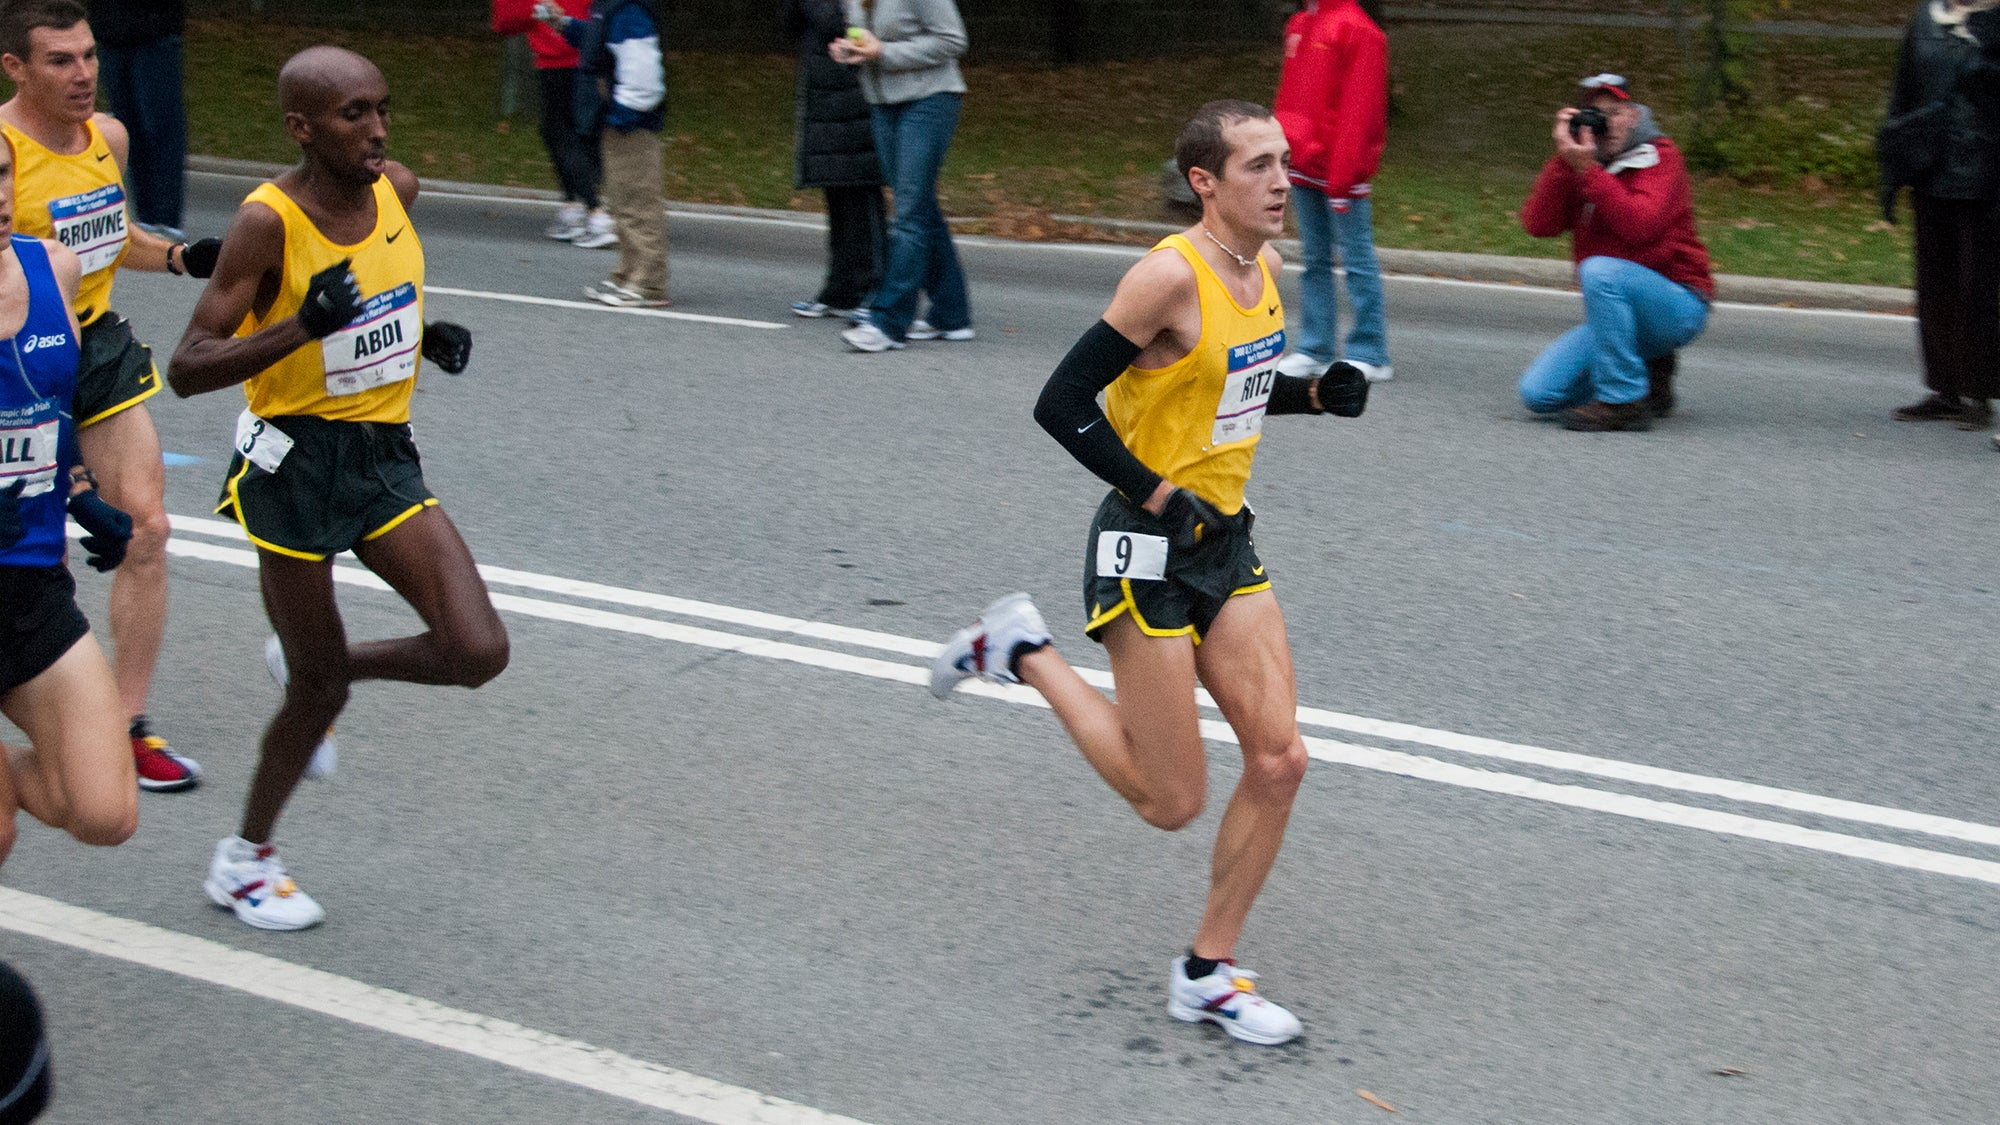 Ritzenhein 07 Marathon Trials